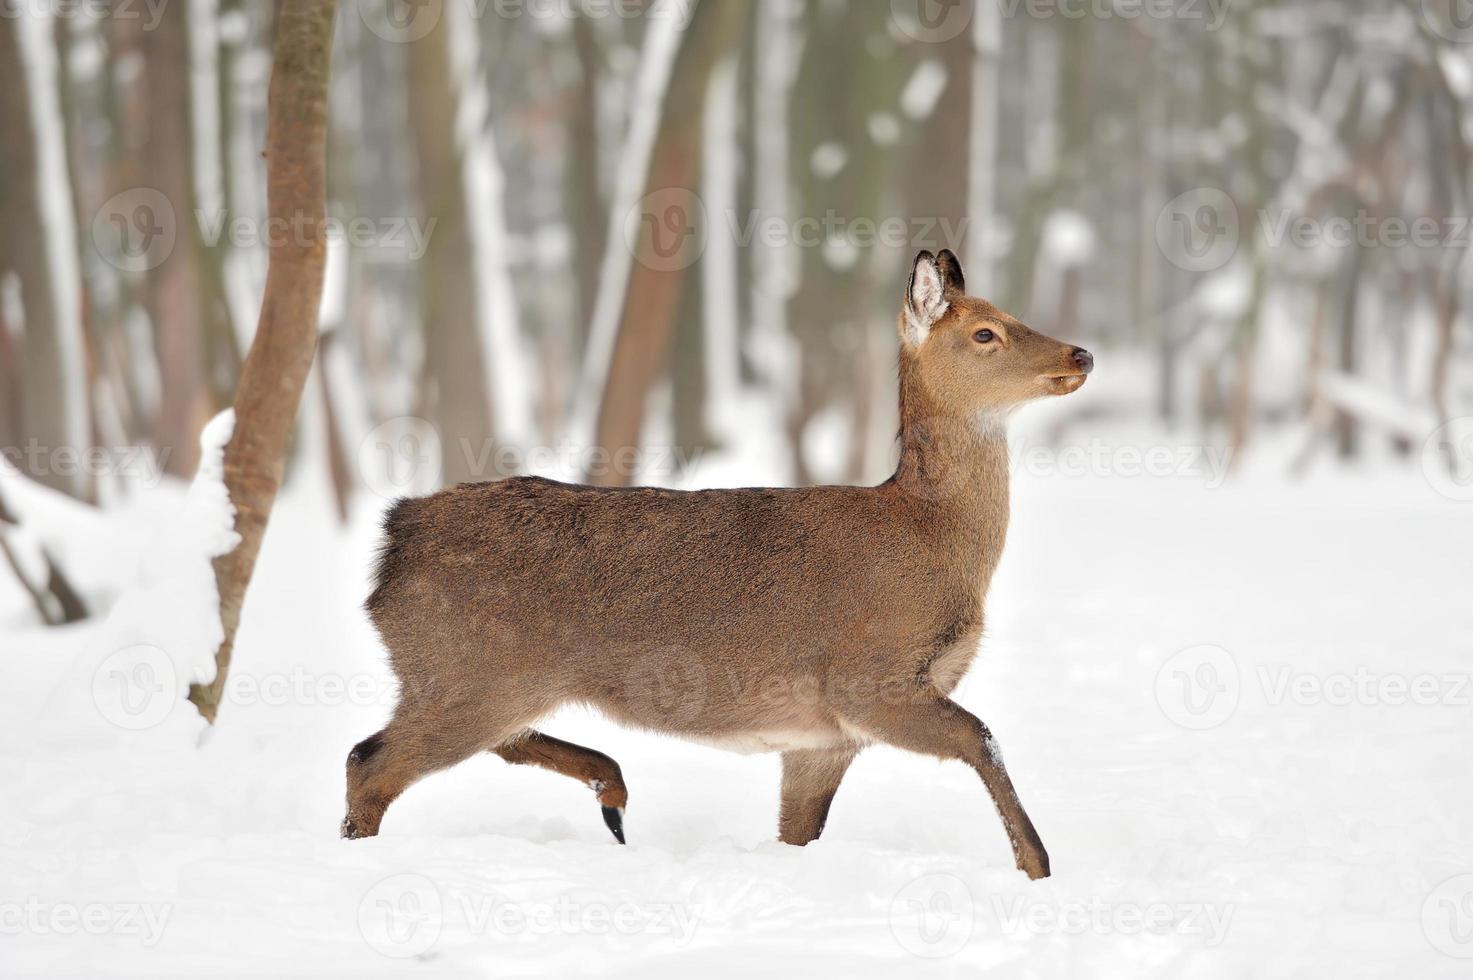 Young deer photo